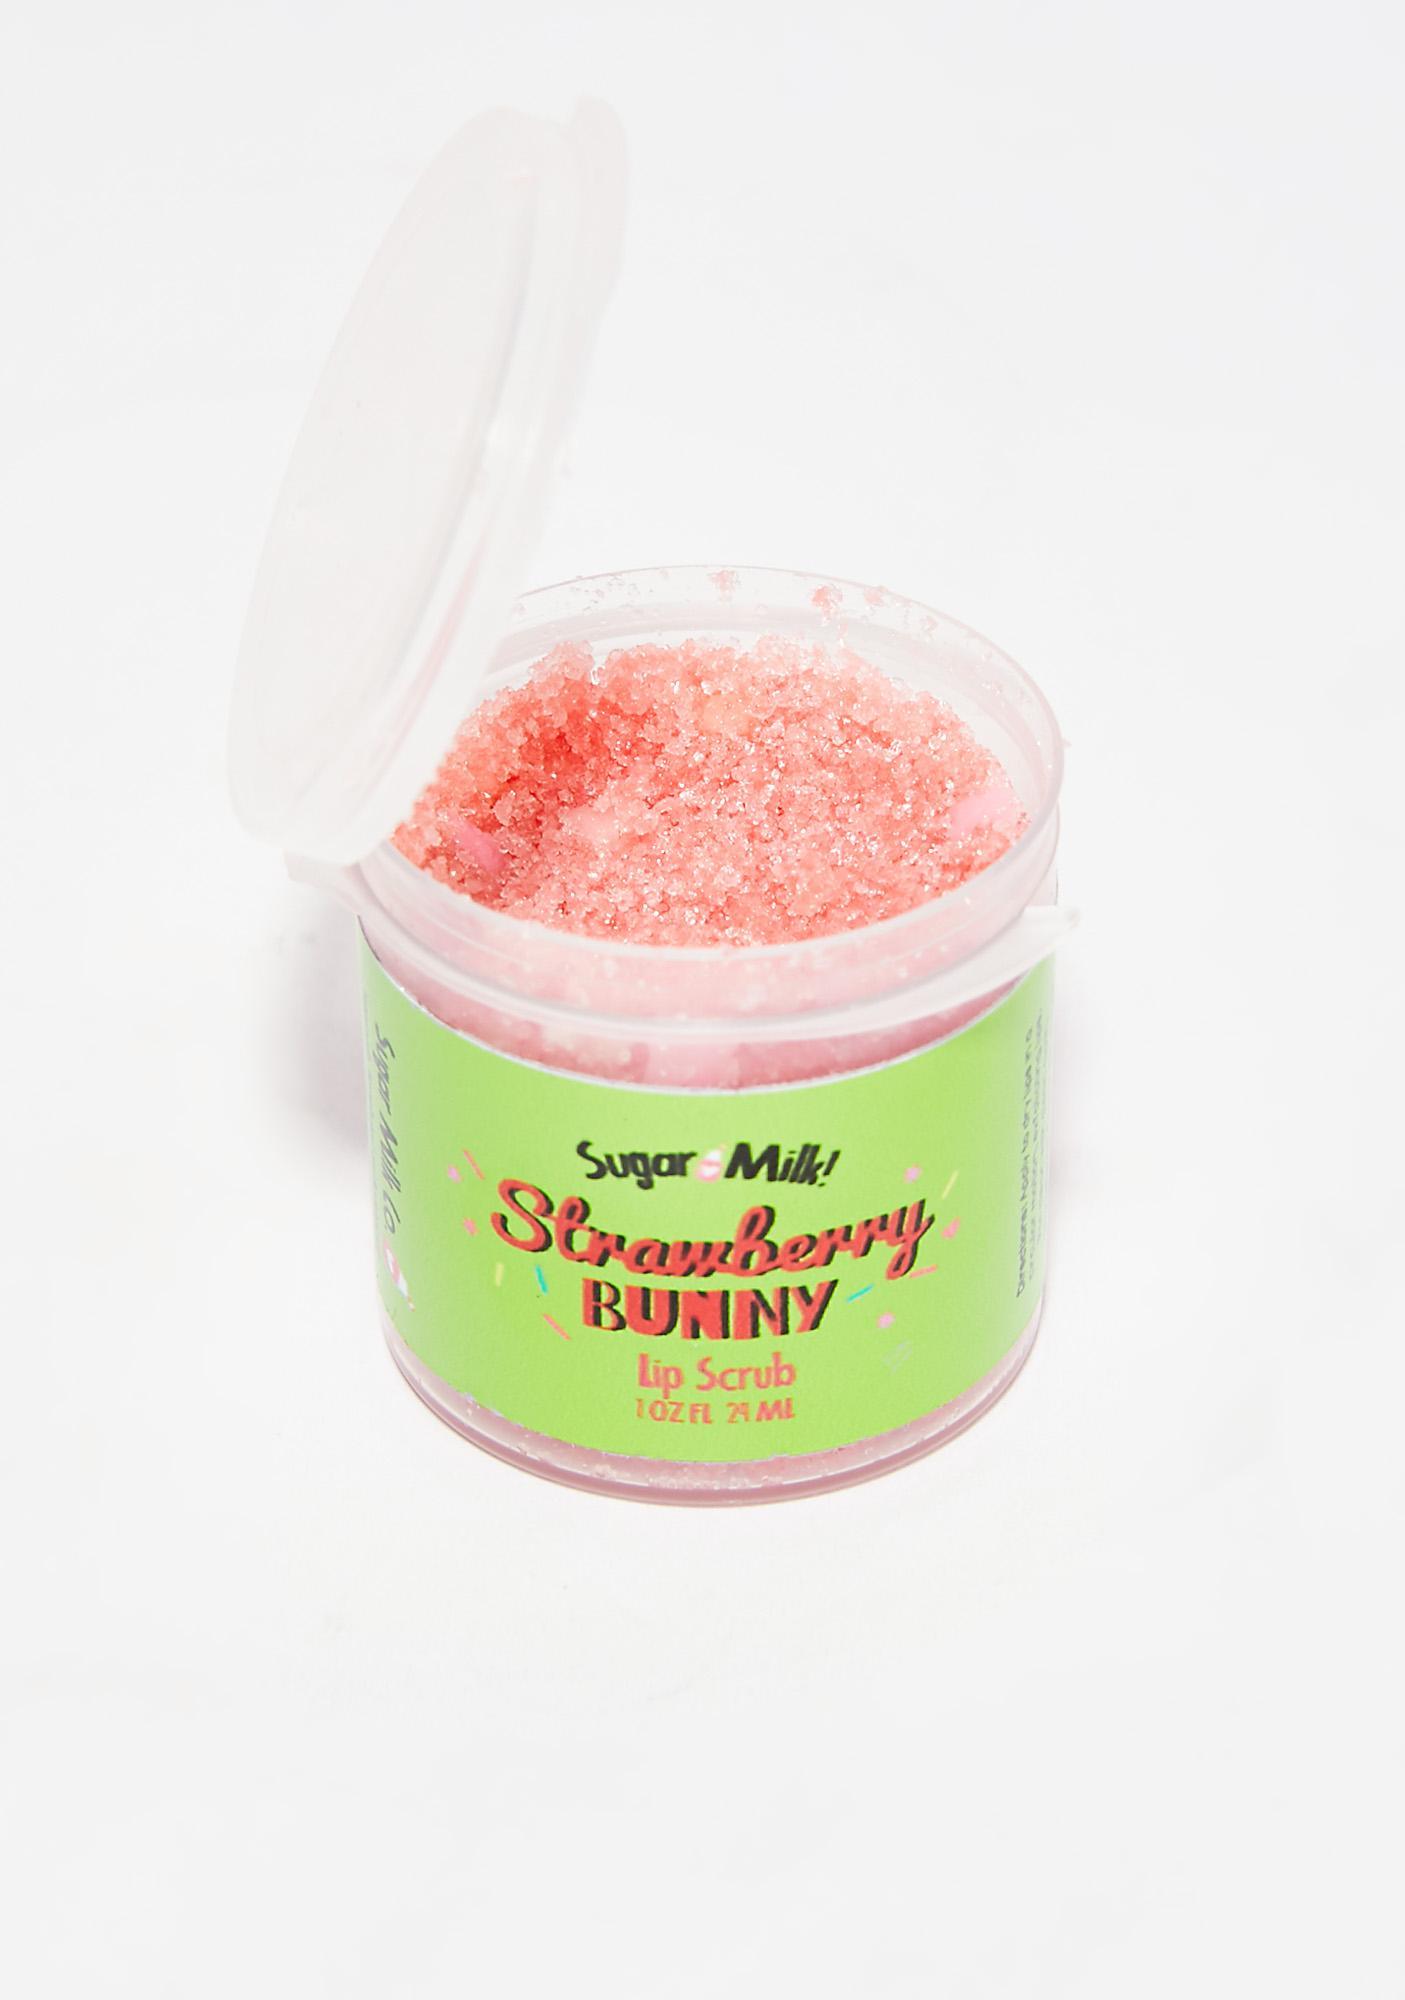 Sugar Milk Co Strawberry Bunny Lip Scrub